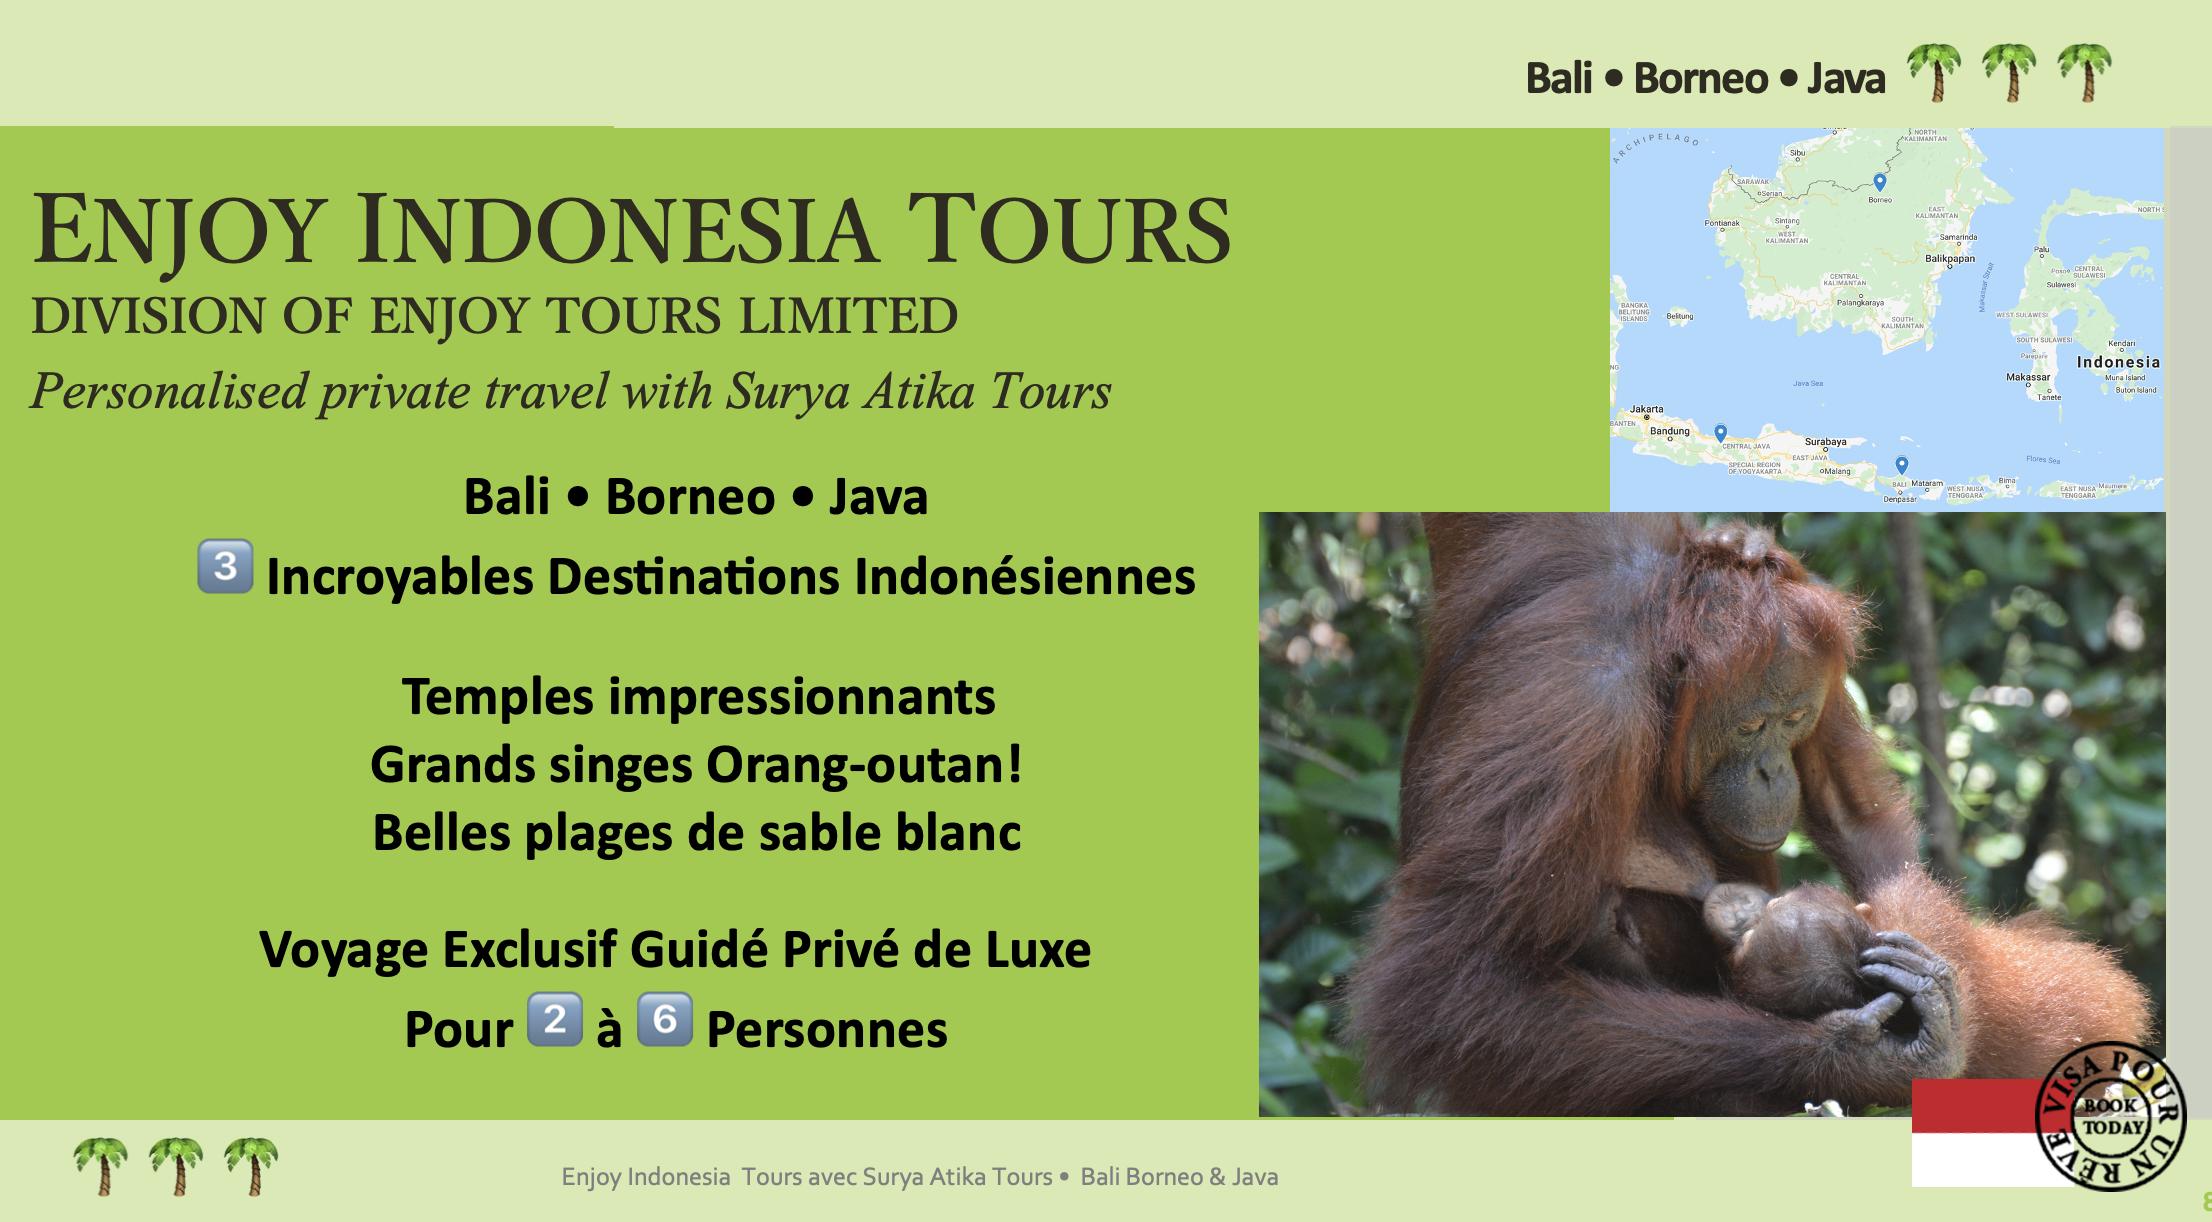 Enjoy Indonesia Tours Bali Borneo Java French Pg 1